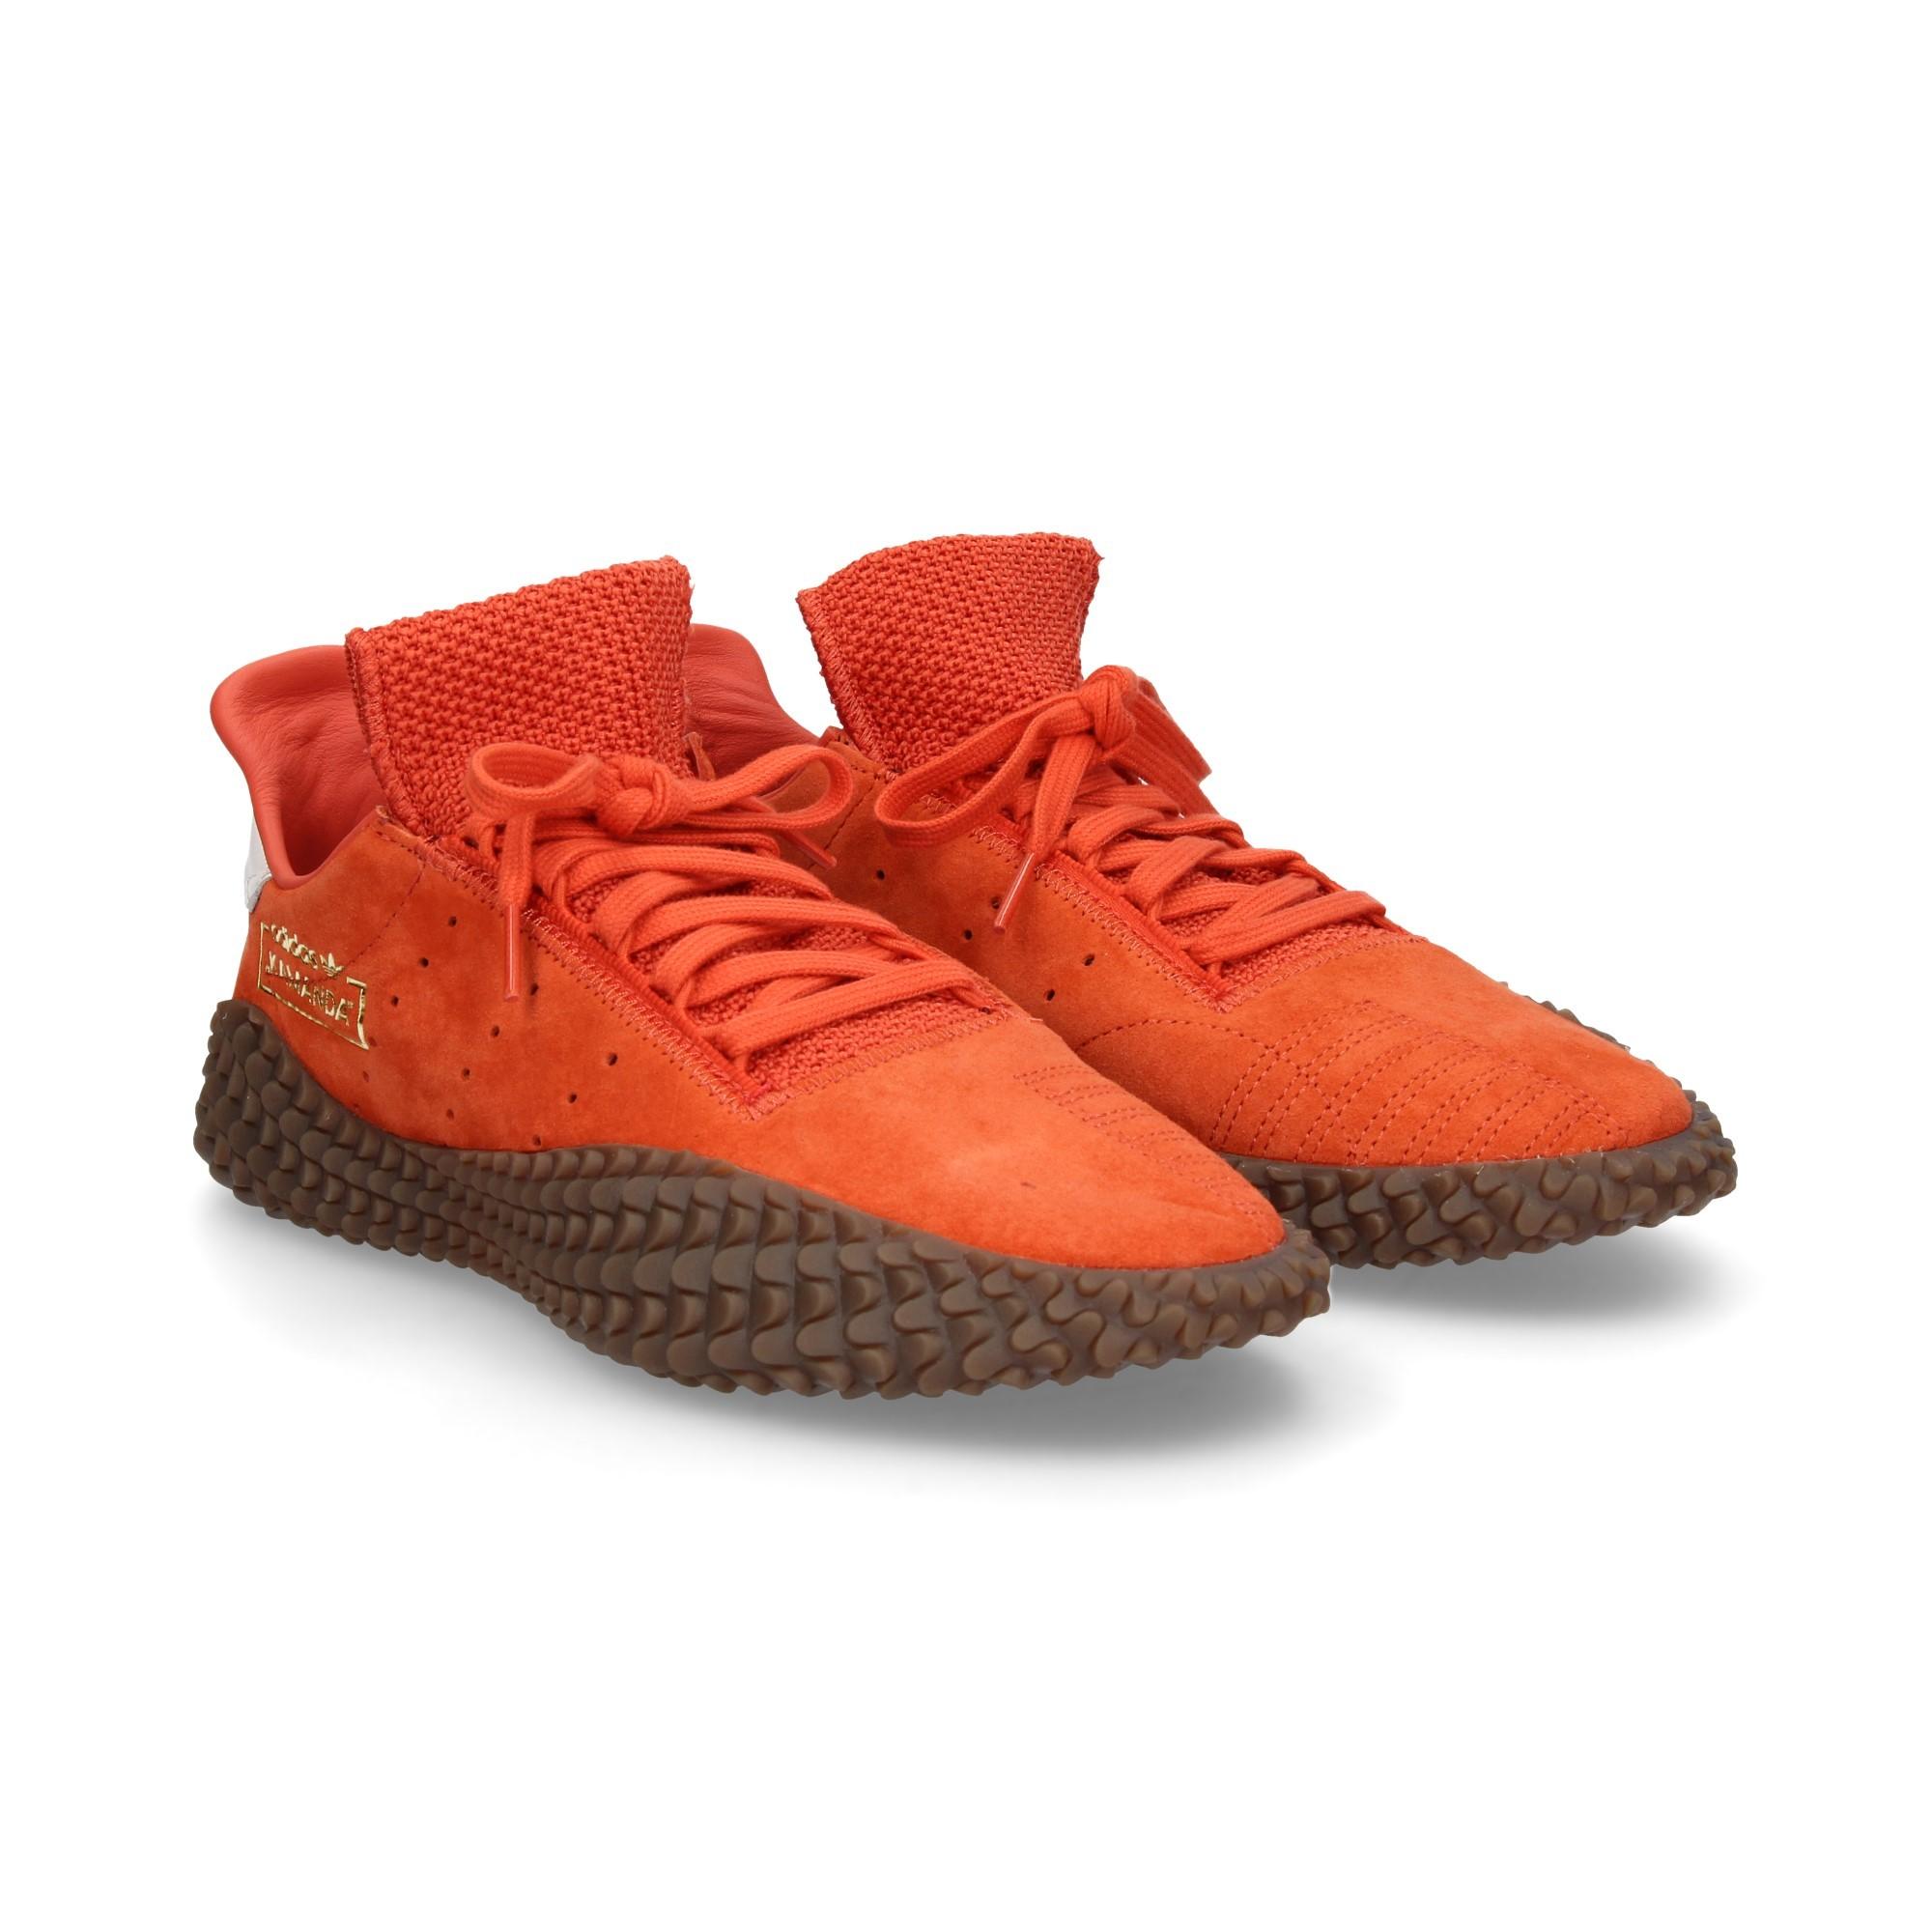 sporty-orange-suede